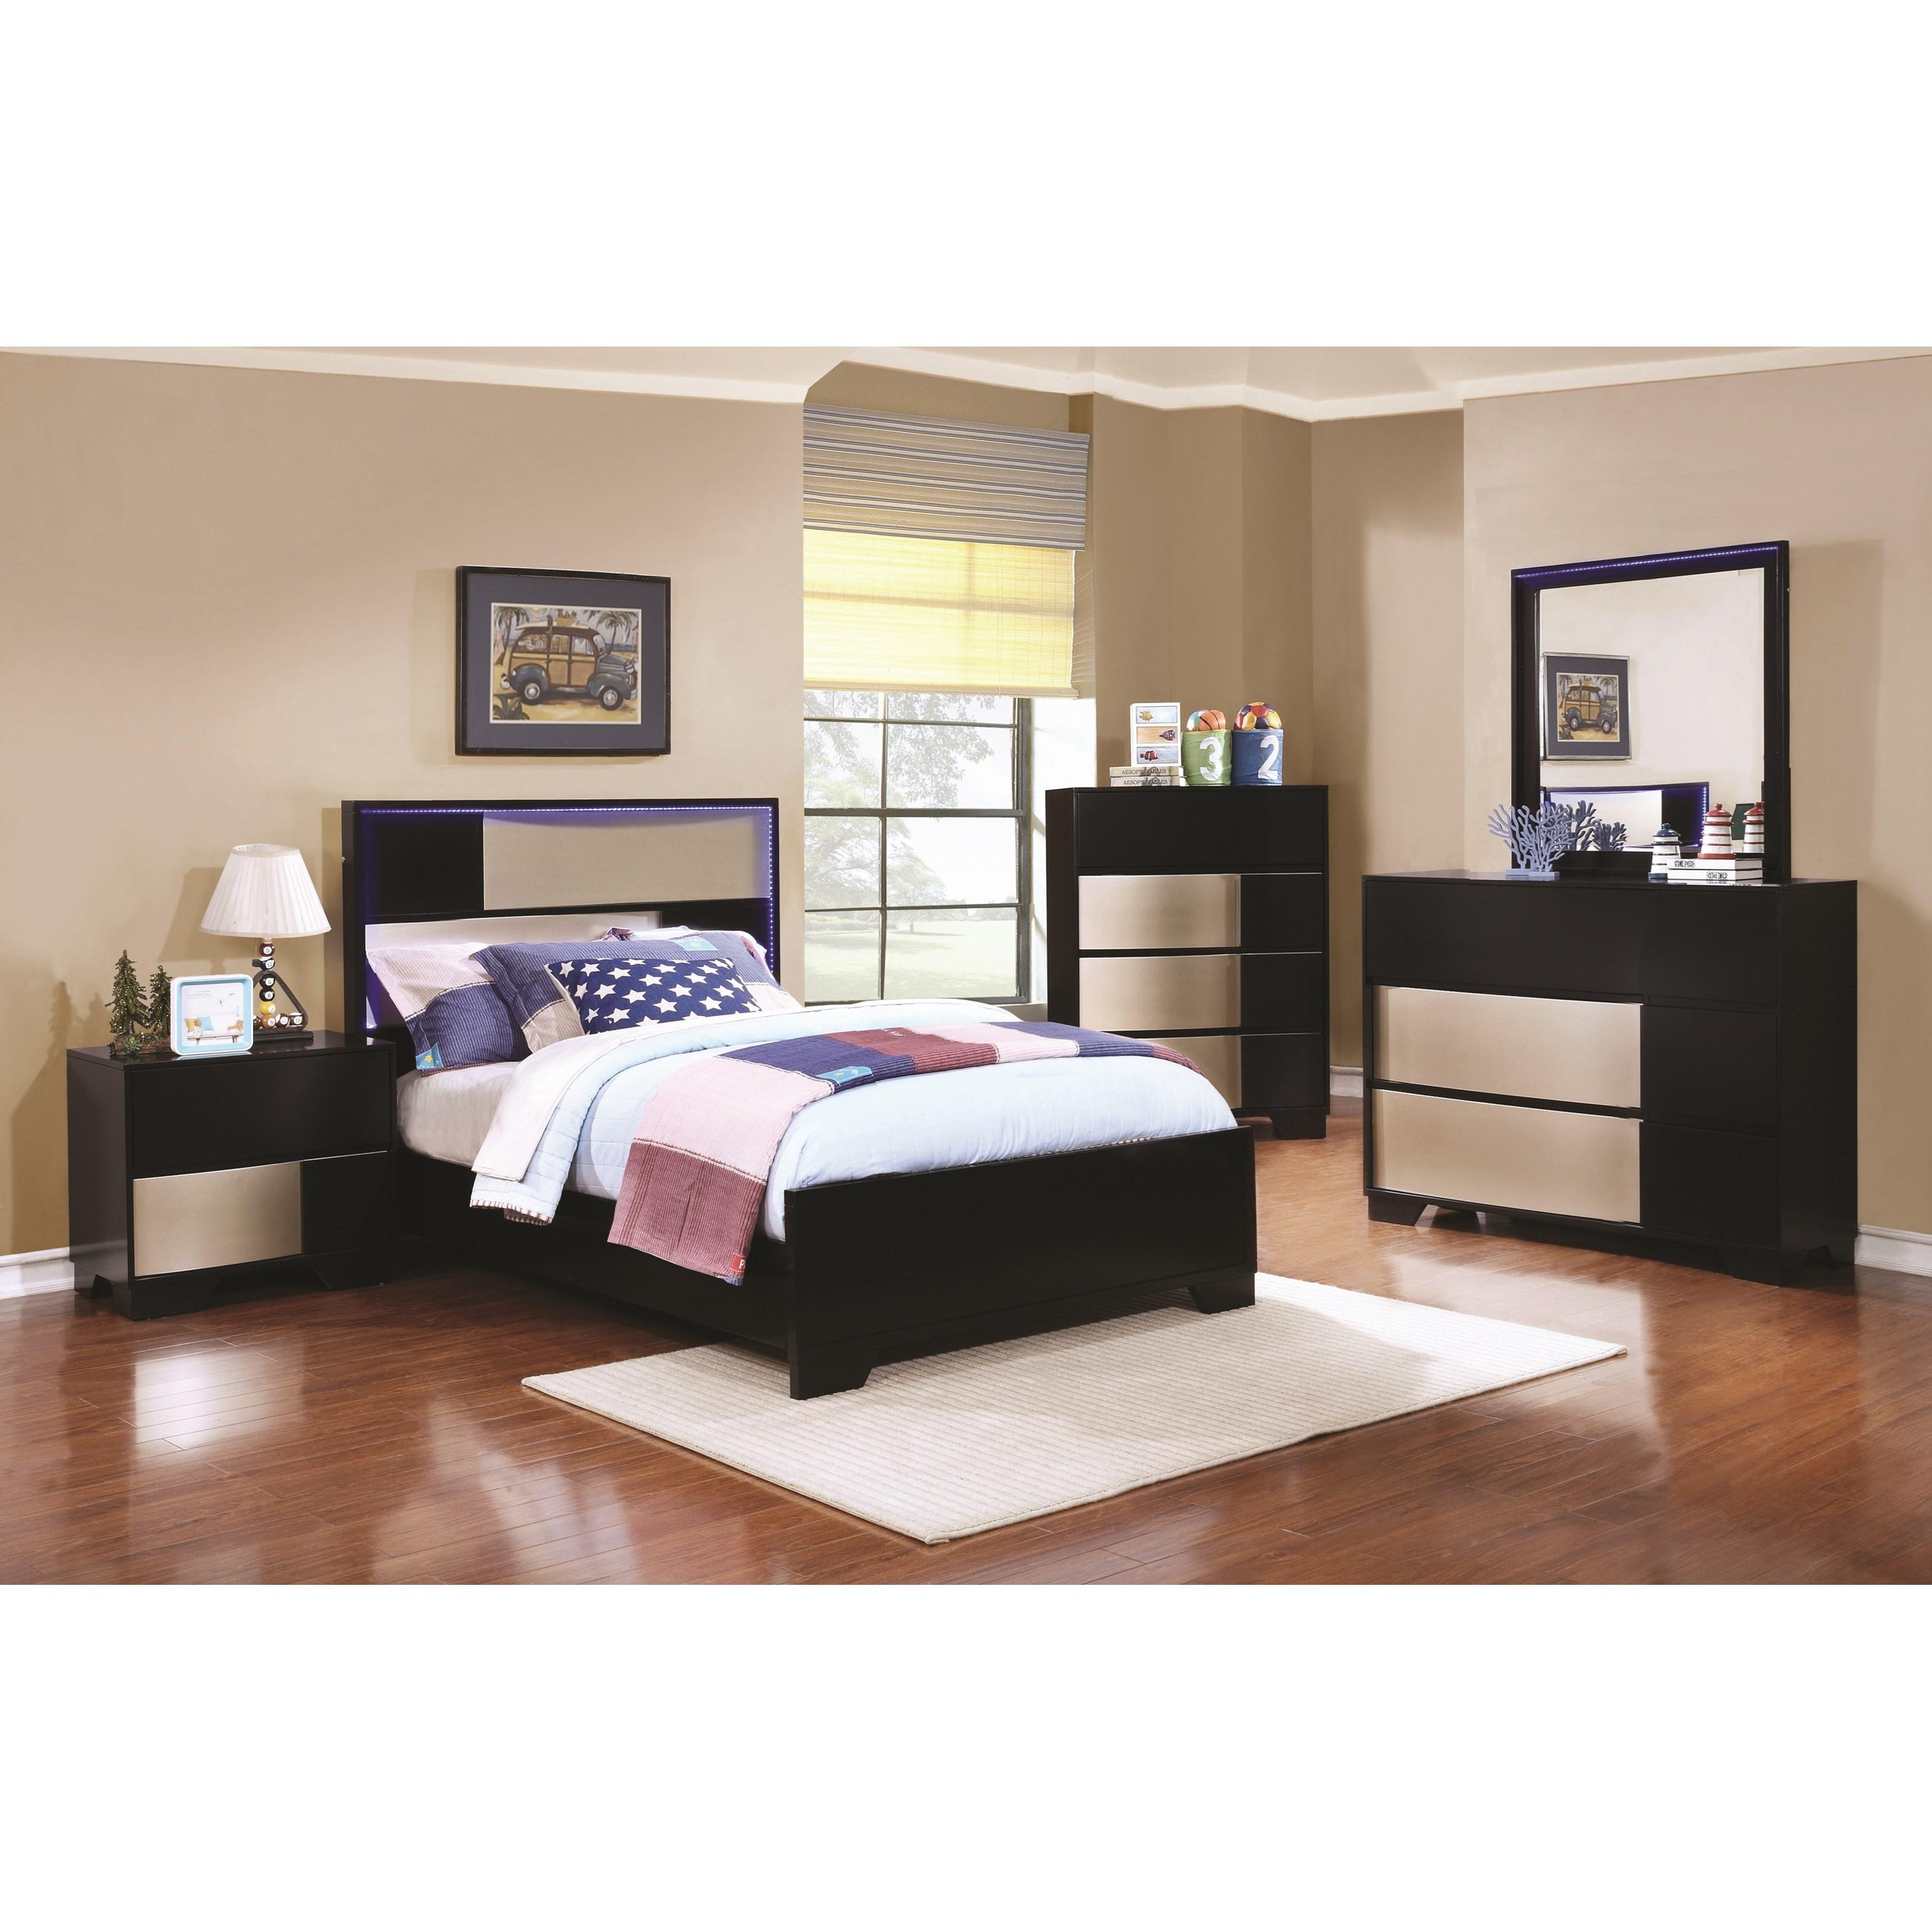 Coaster Havering Full Bedroom Group - Item Number: 40087 F Bedroom Group 1